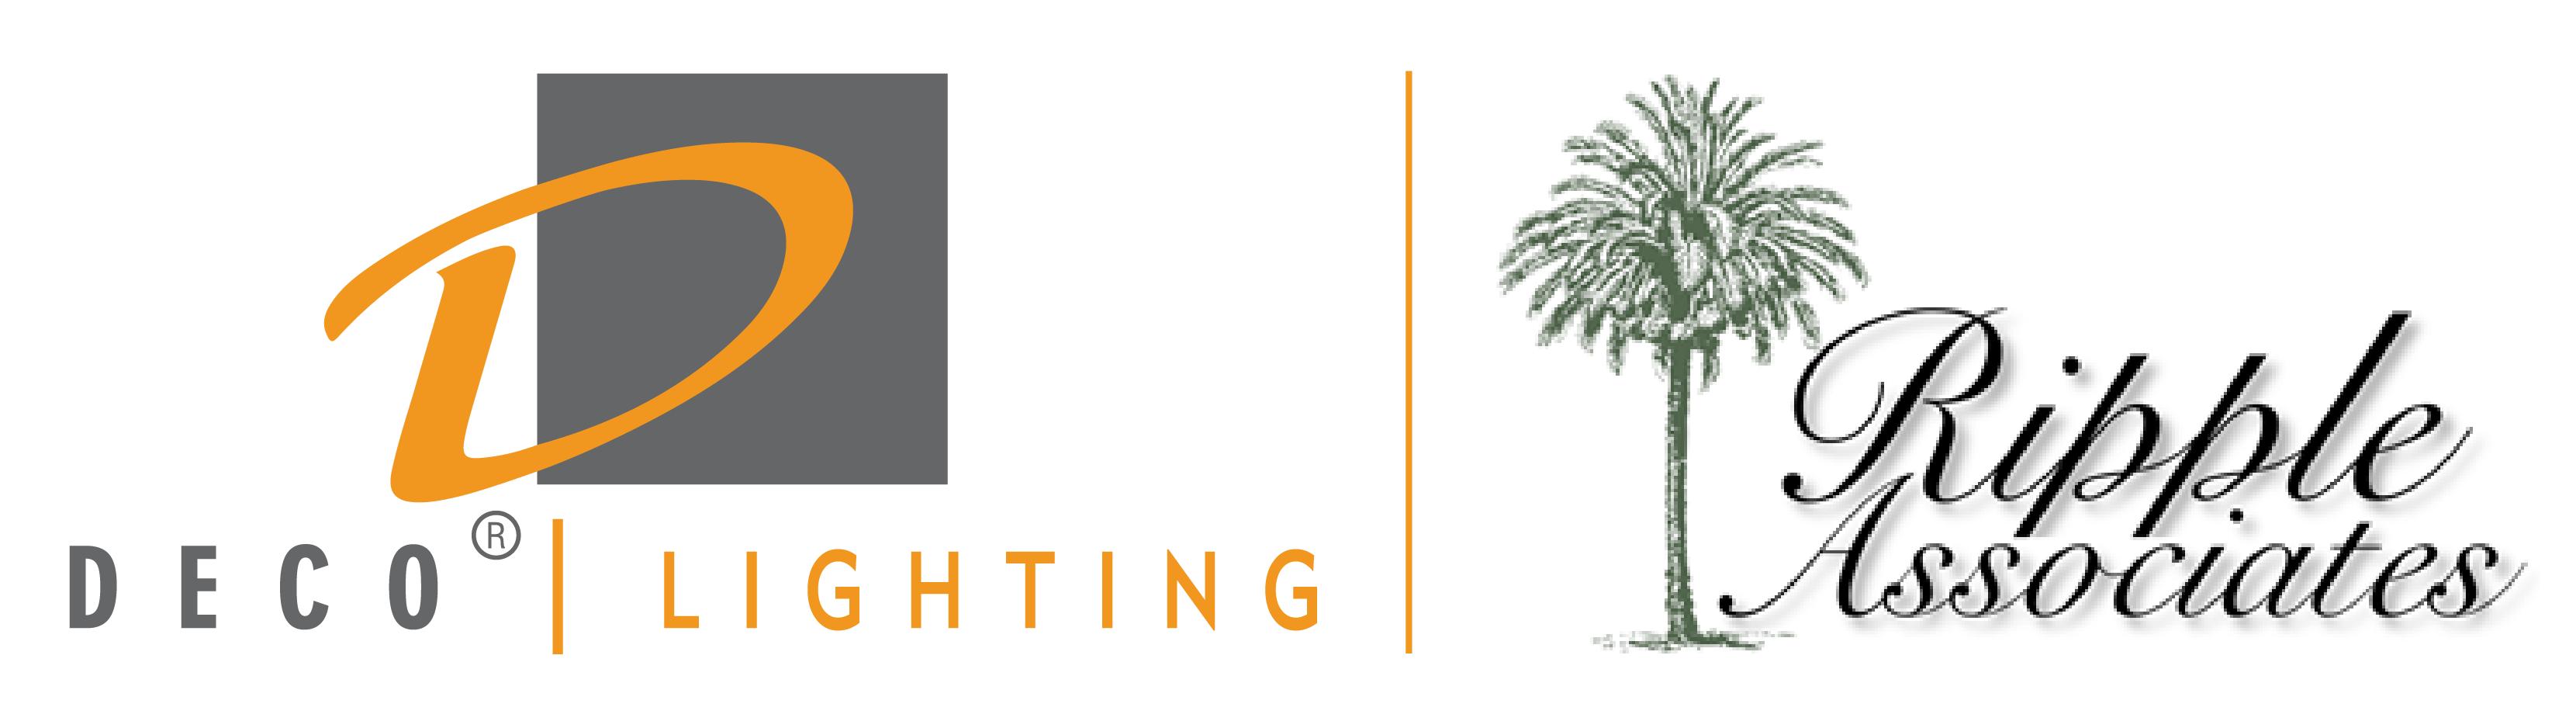 deco lighting appoints ripple associates as florida sales